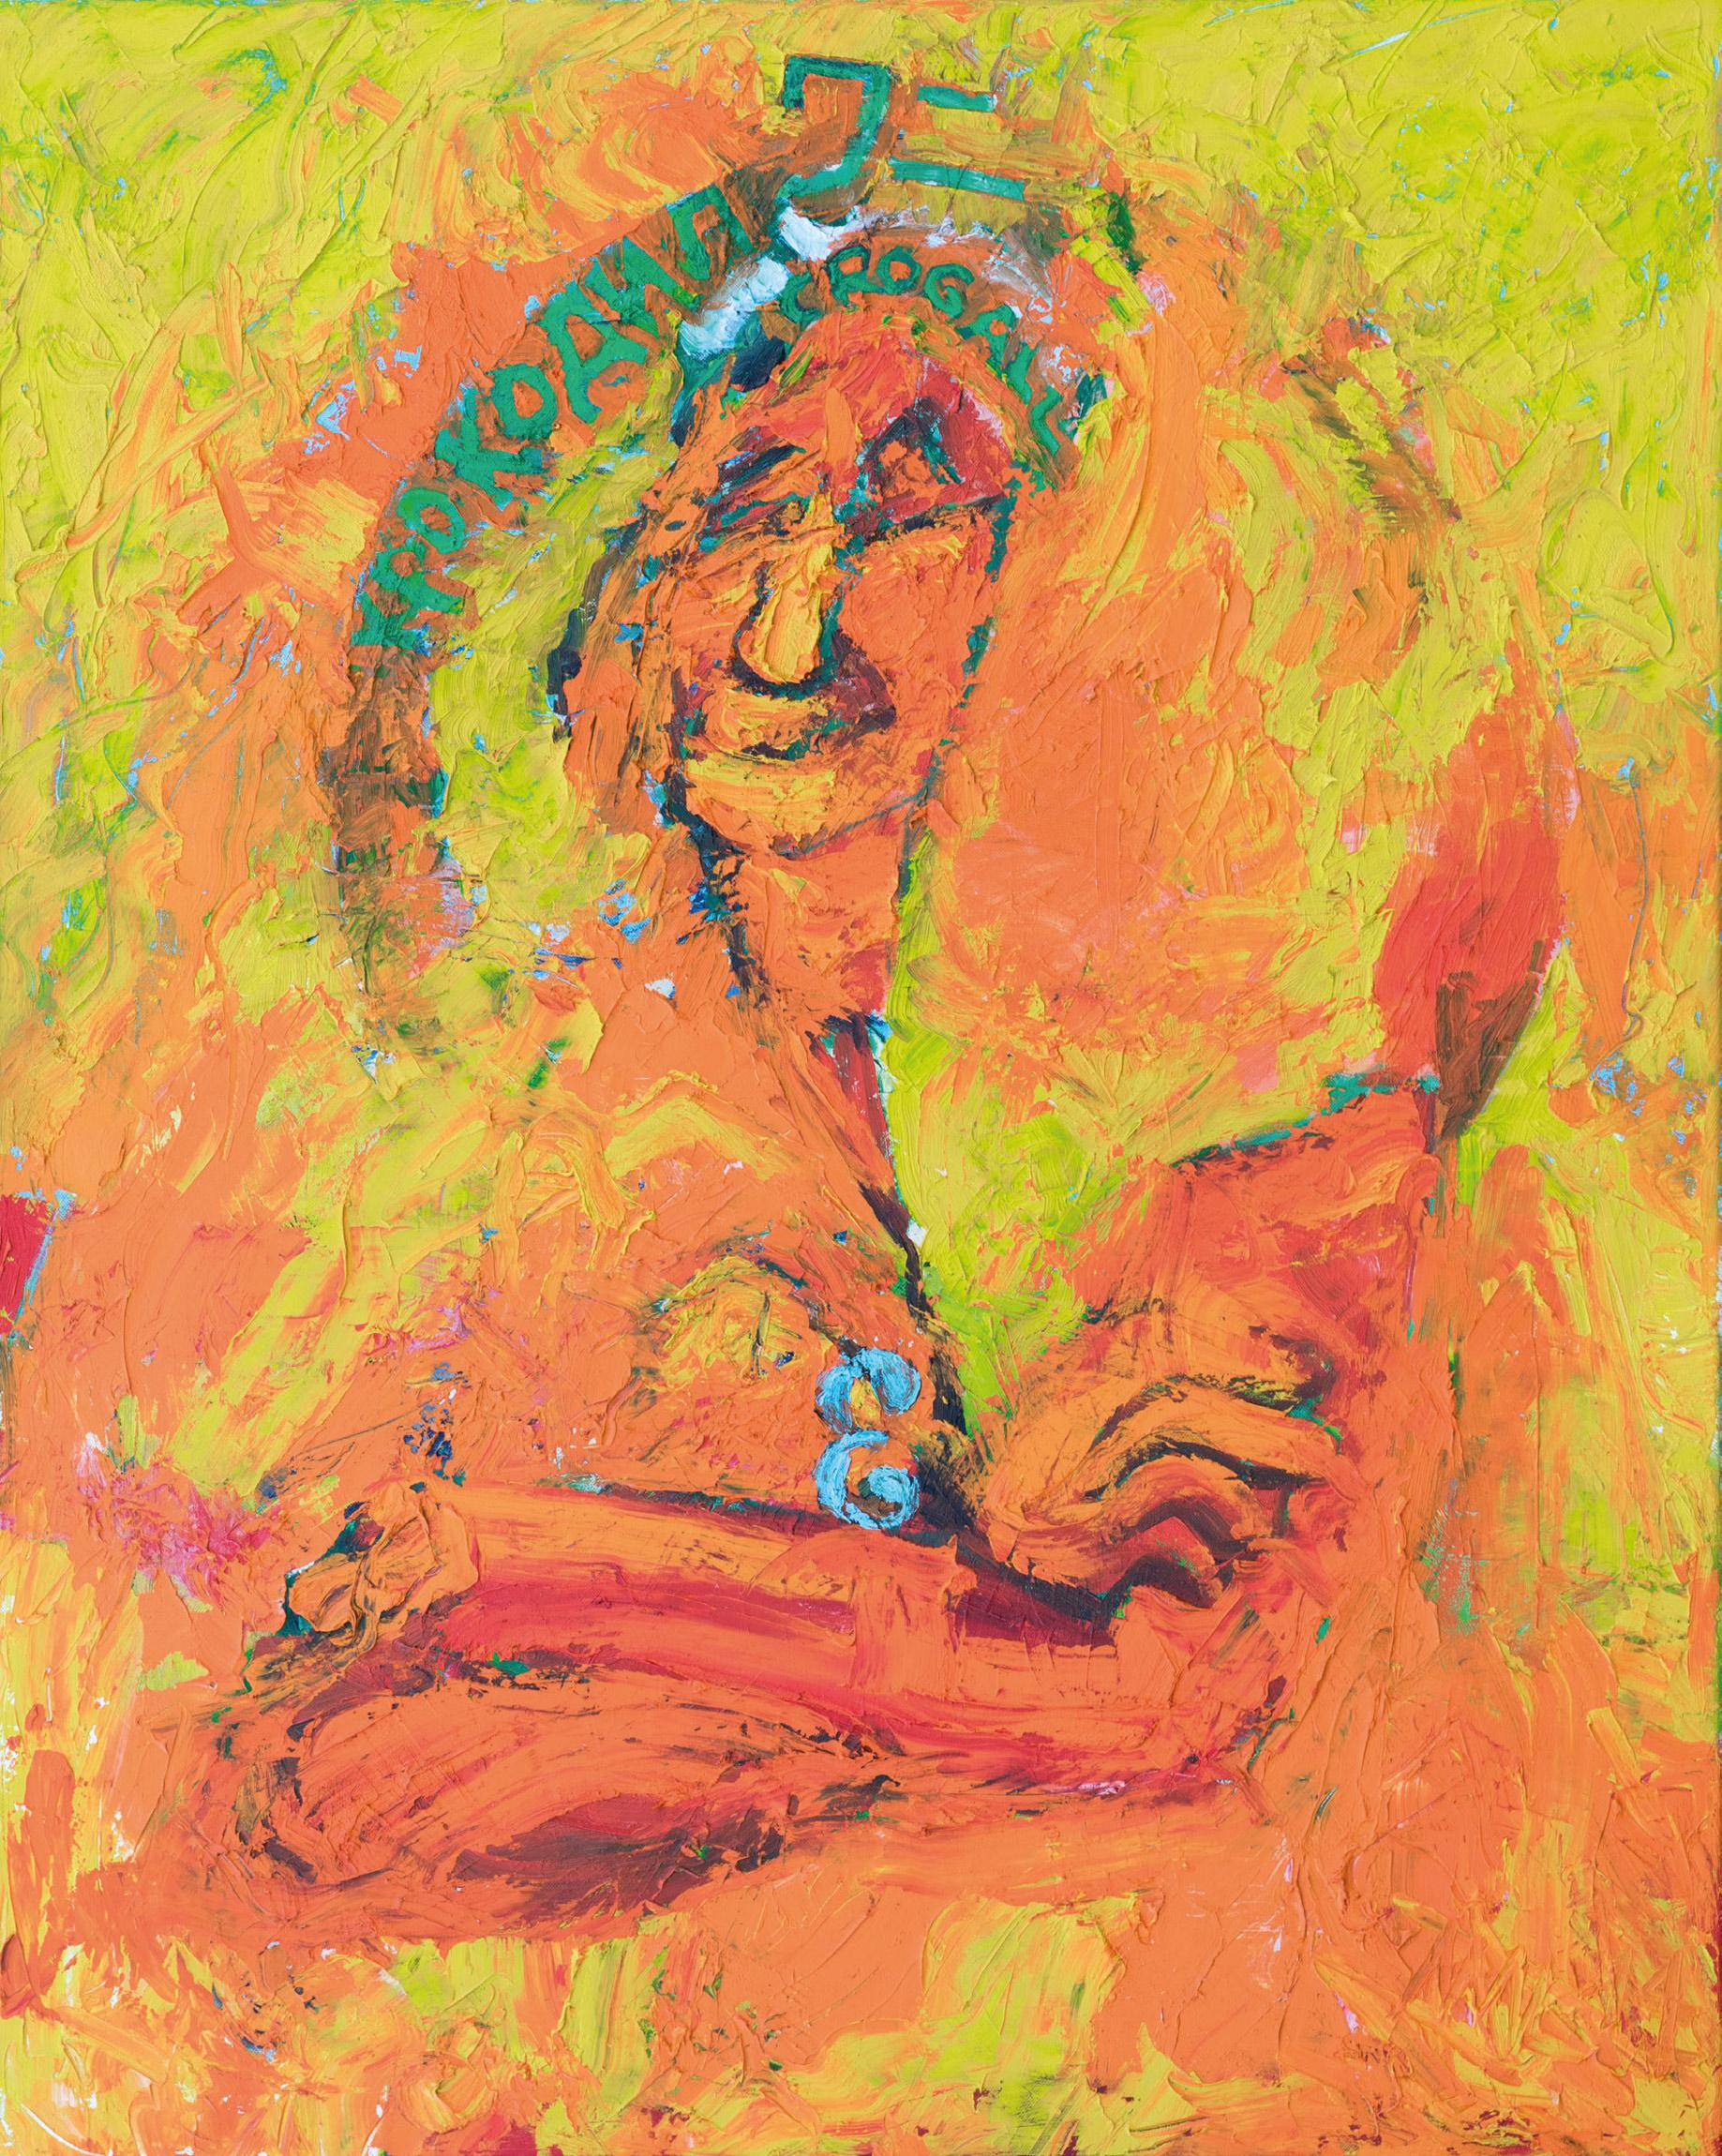 Nil Auslaender Selbstdritt (Selbstportrait), Die Ahnen, ©Nil Auslaender